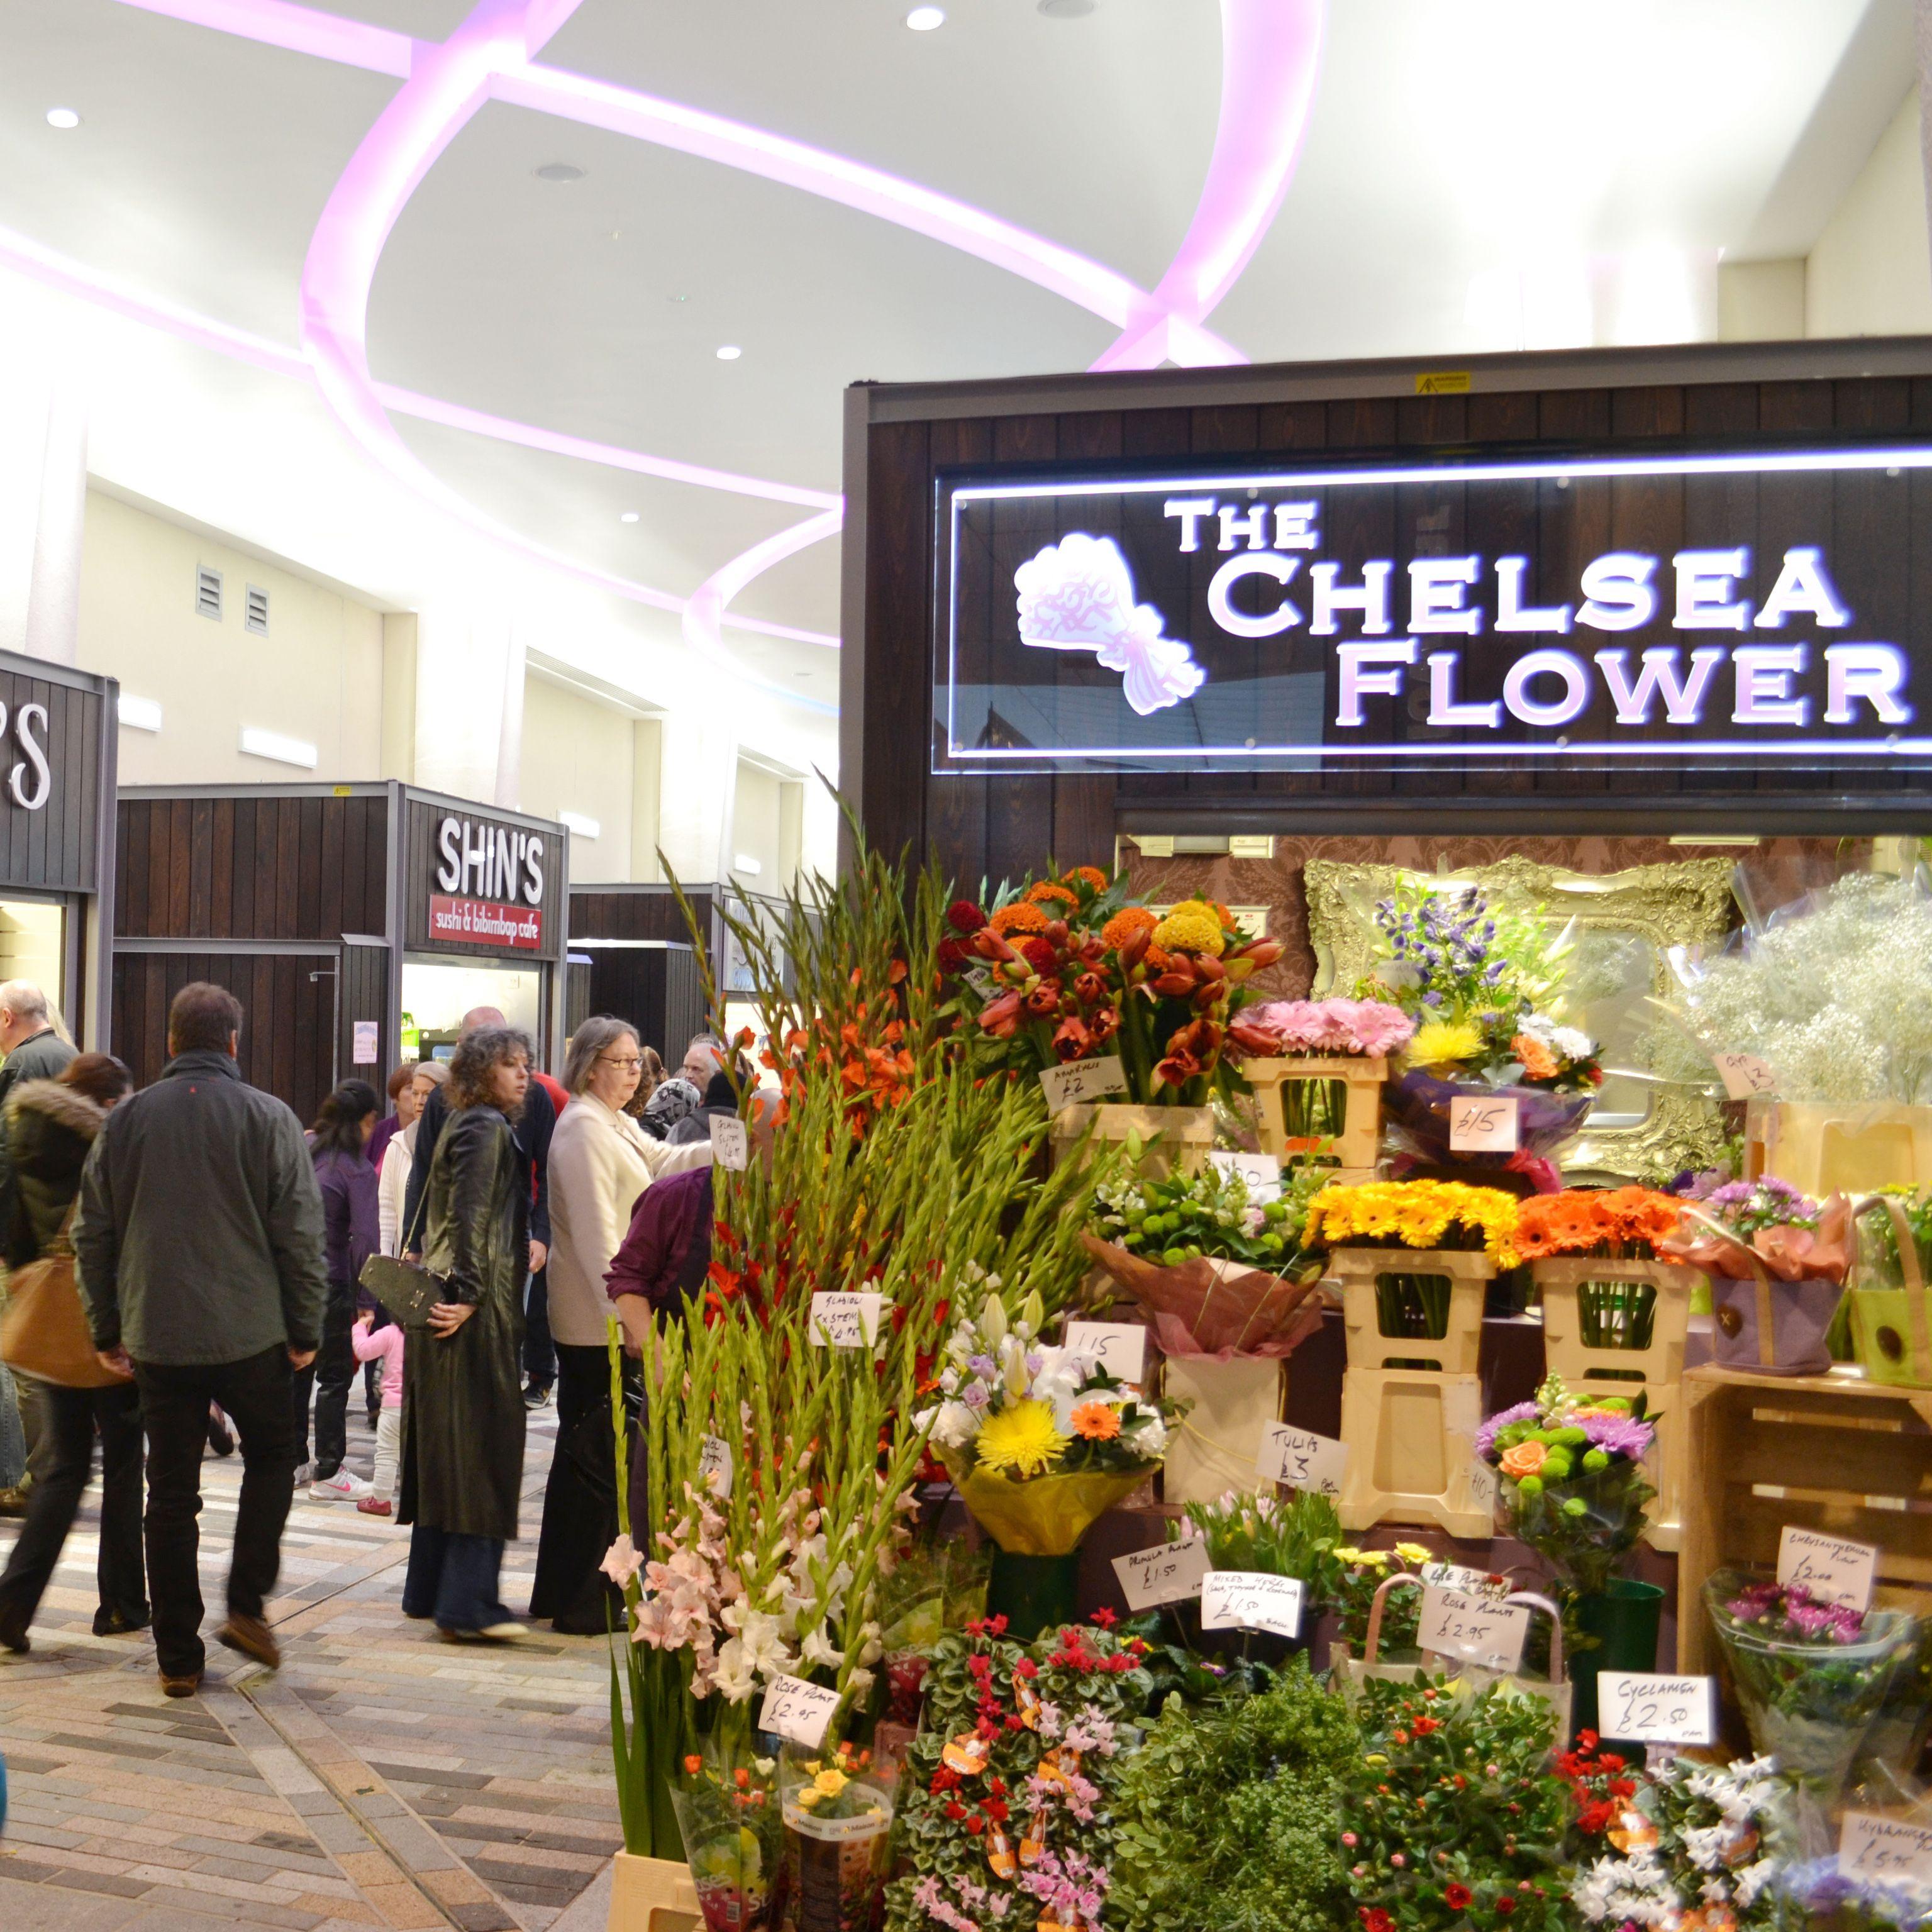 The chelsea flower shop in woking market walk offer their customers the chelsea flower shop in woking market walk offer their customers fresh bunches of flowers izmirmasajfo Gallery